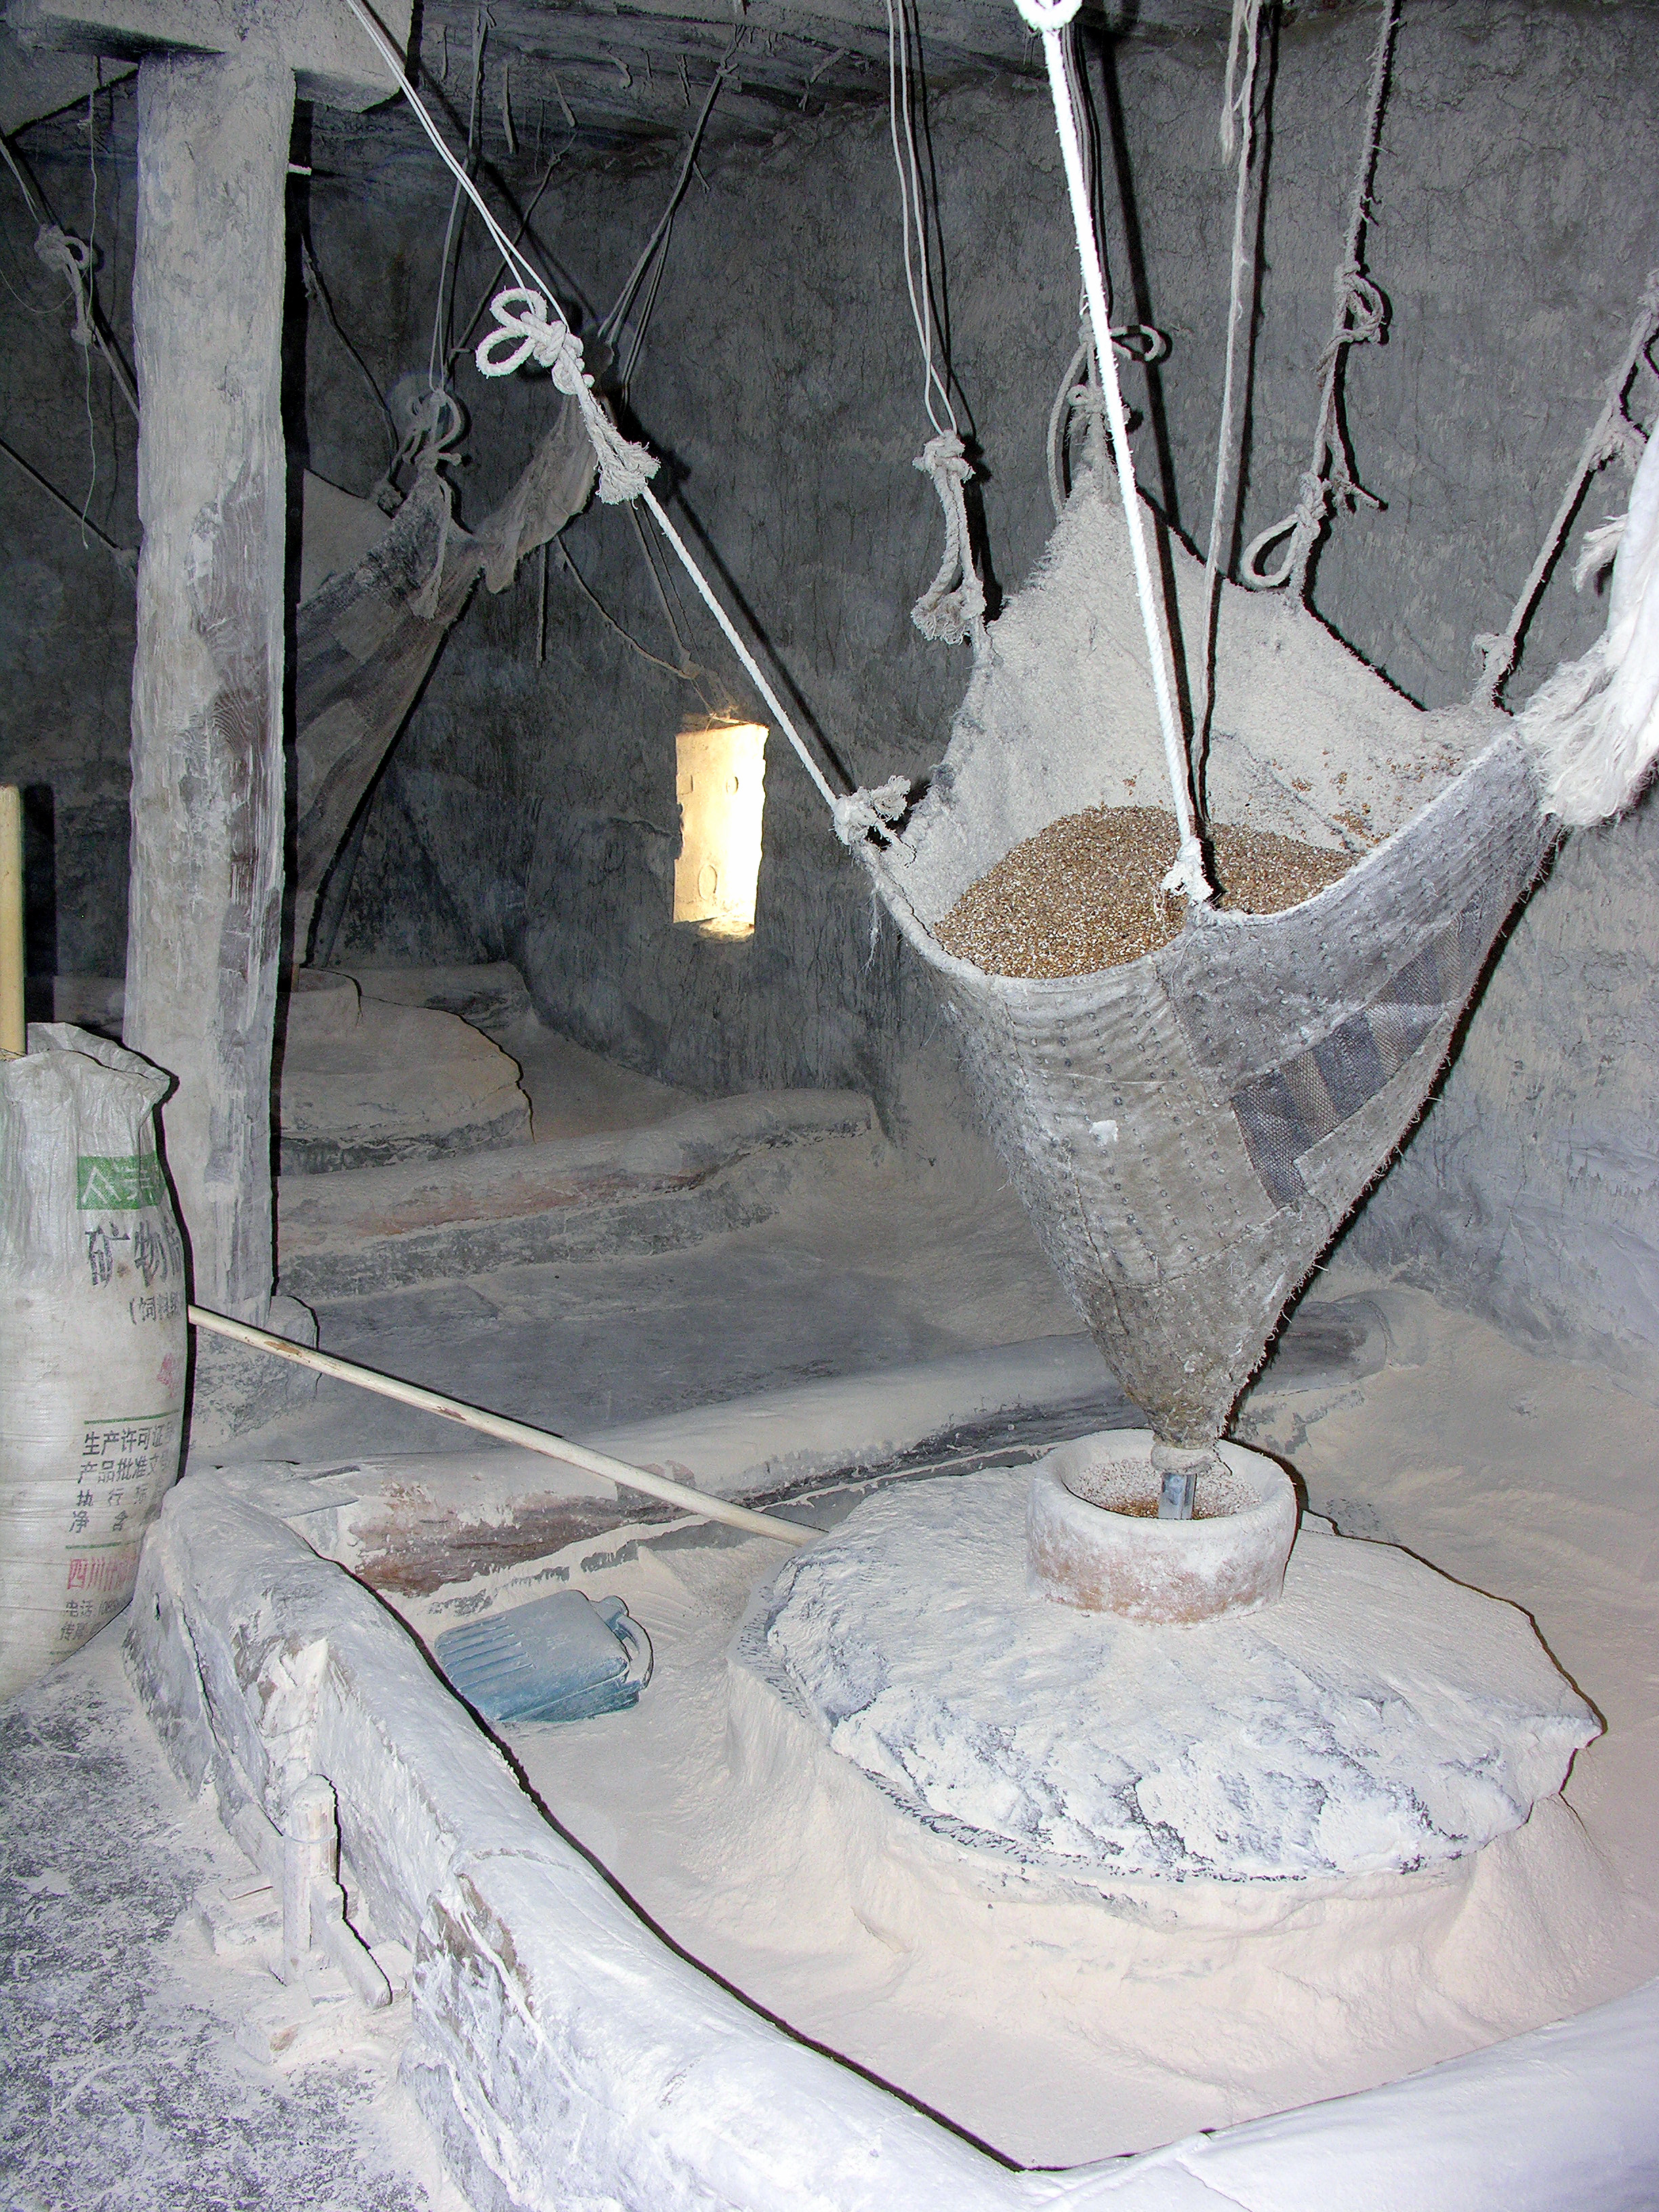 Tibetan flour mill